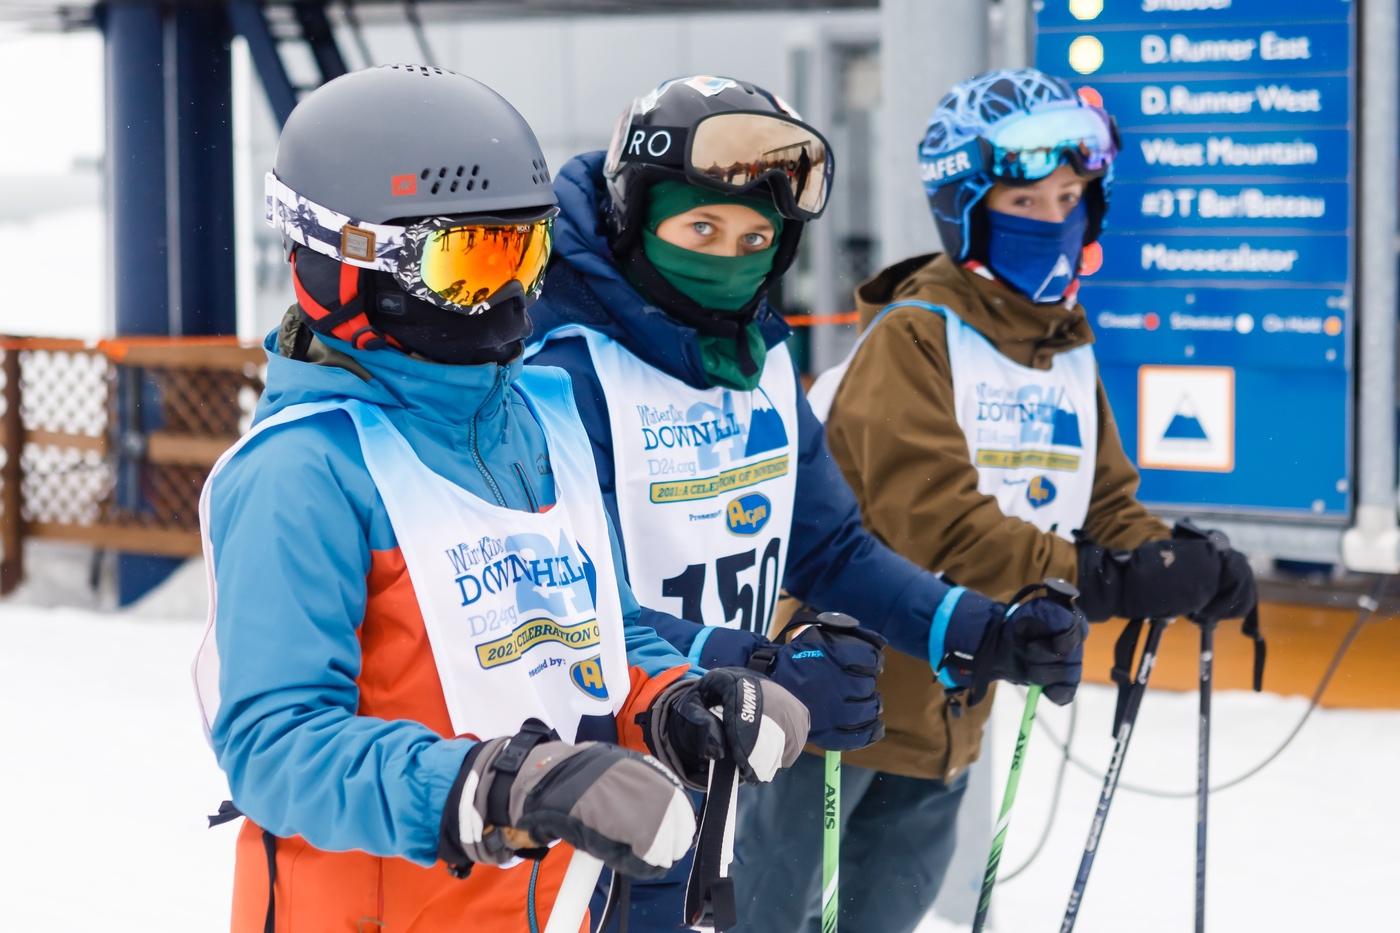 WinterKids Downhill 24 2021 SDP 2692